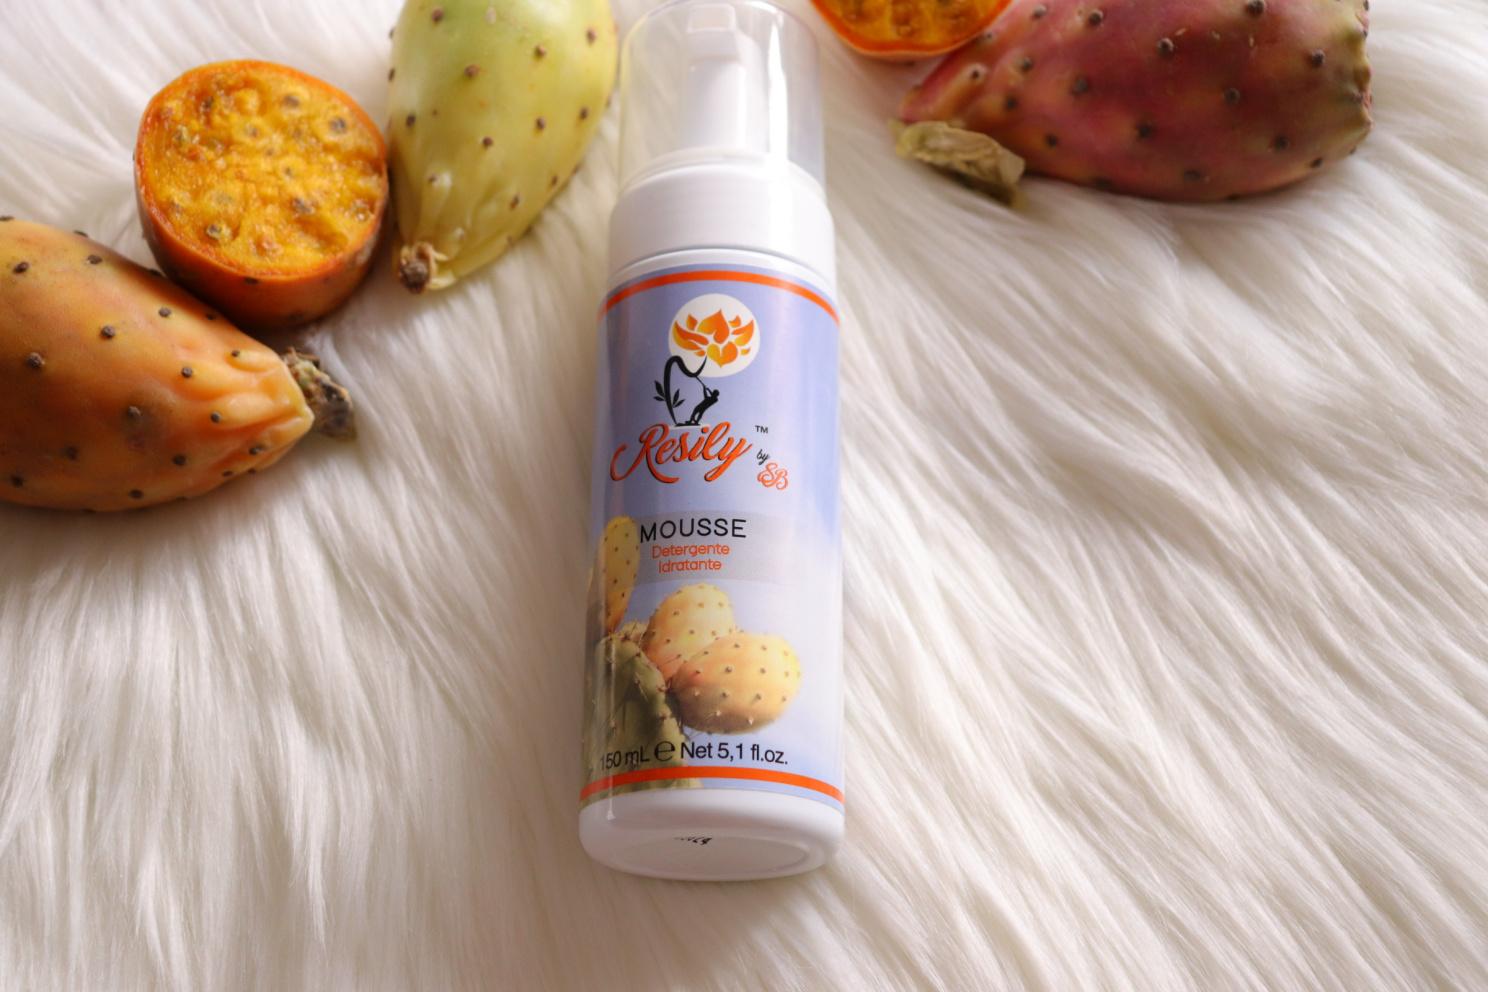 mousse detergente ai fichi d'india resily, cosmetici a base di fico d'india